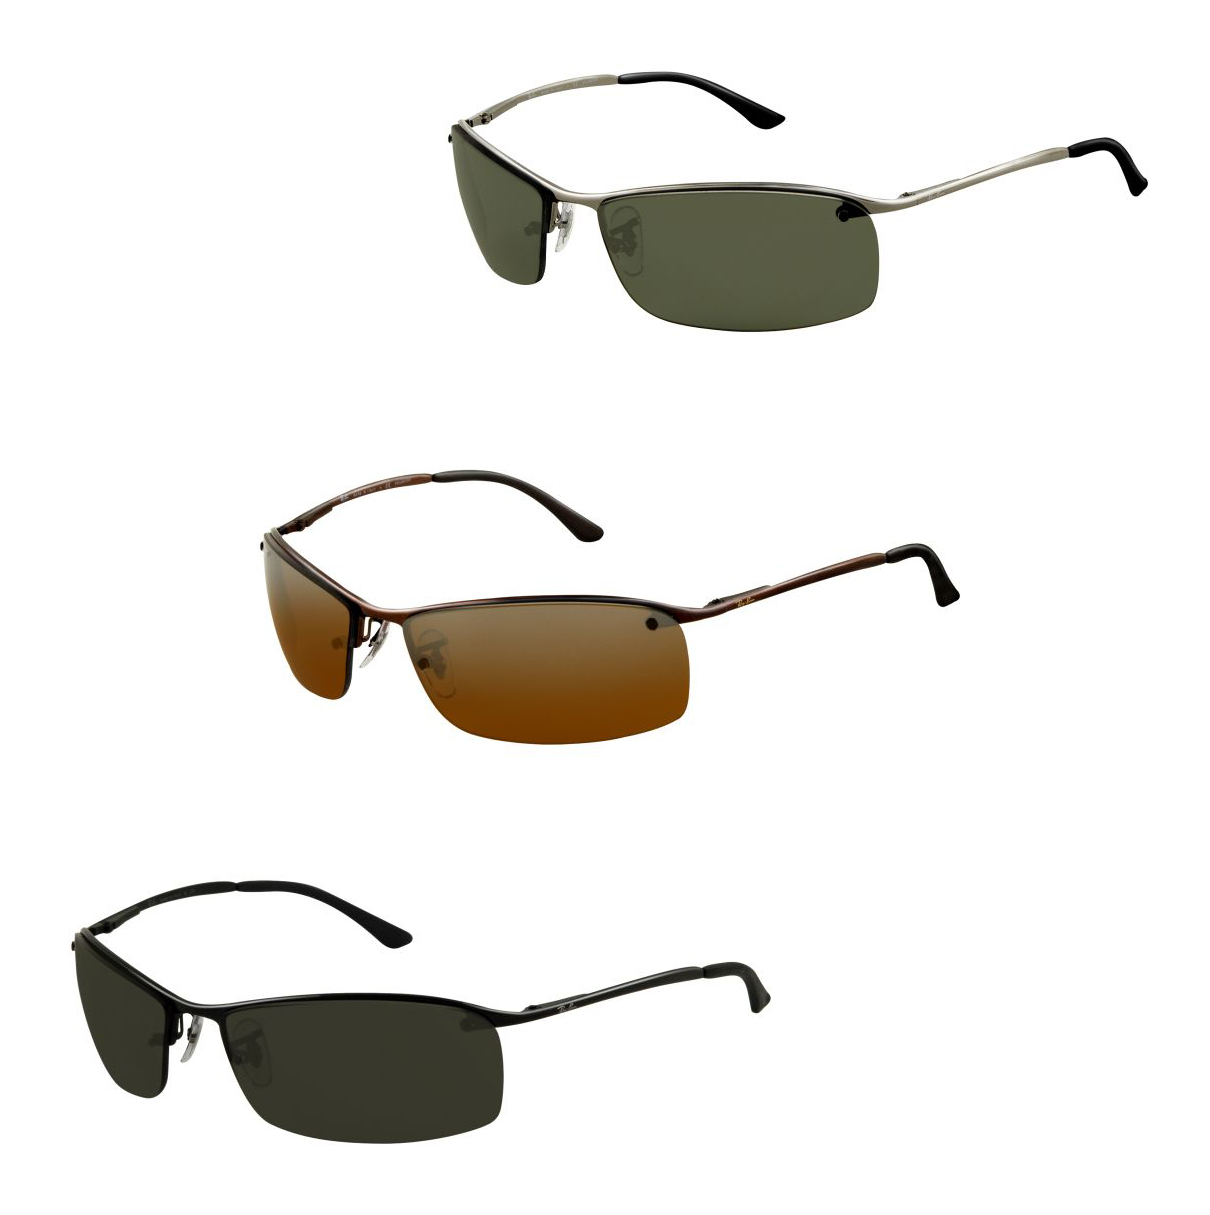 4274e20096505 Ray-Ban Top Bar Sunglasses RB3183 FREE S H RB3183-004-82-63